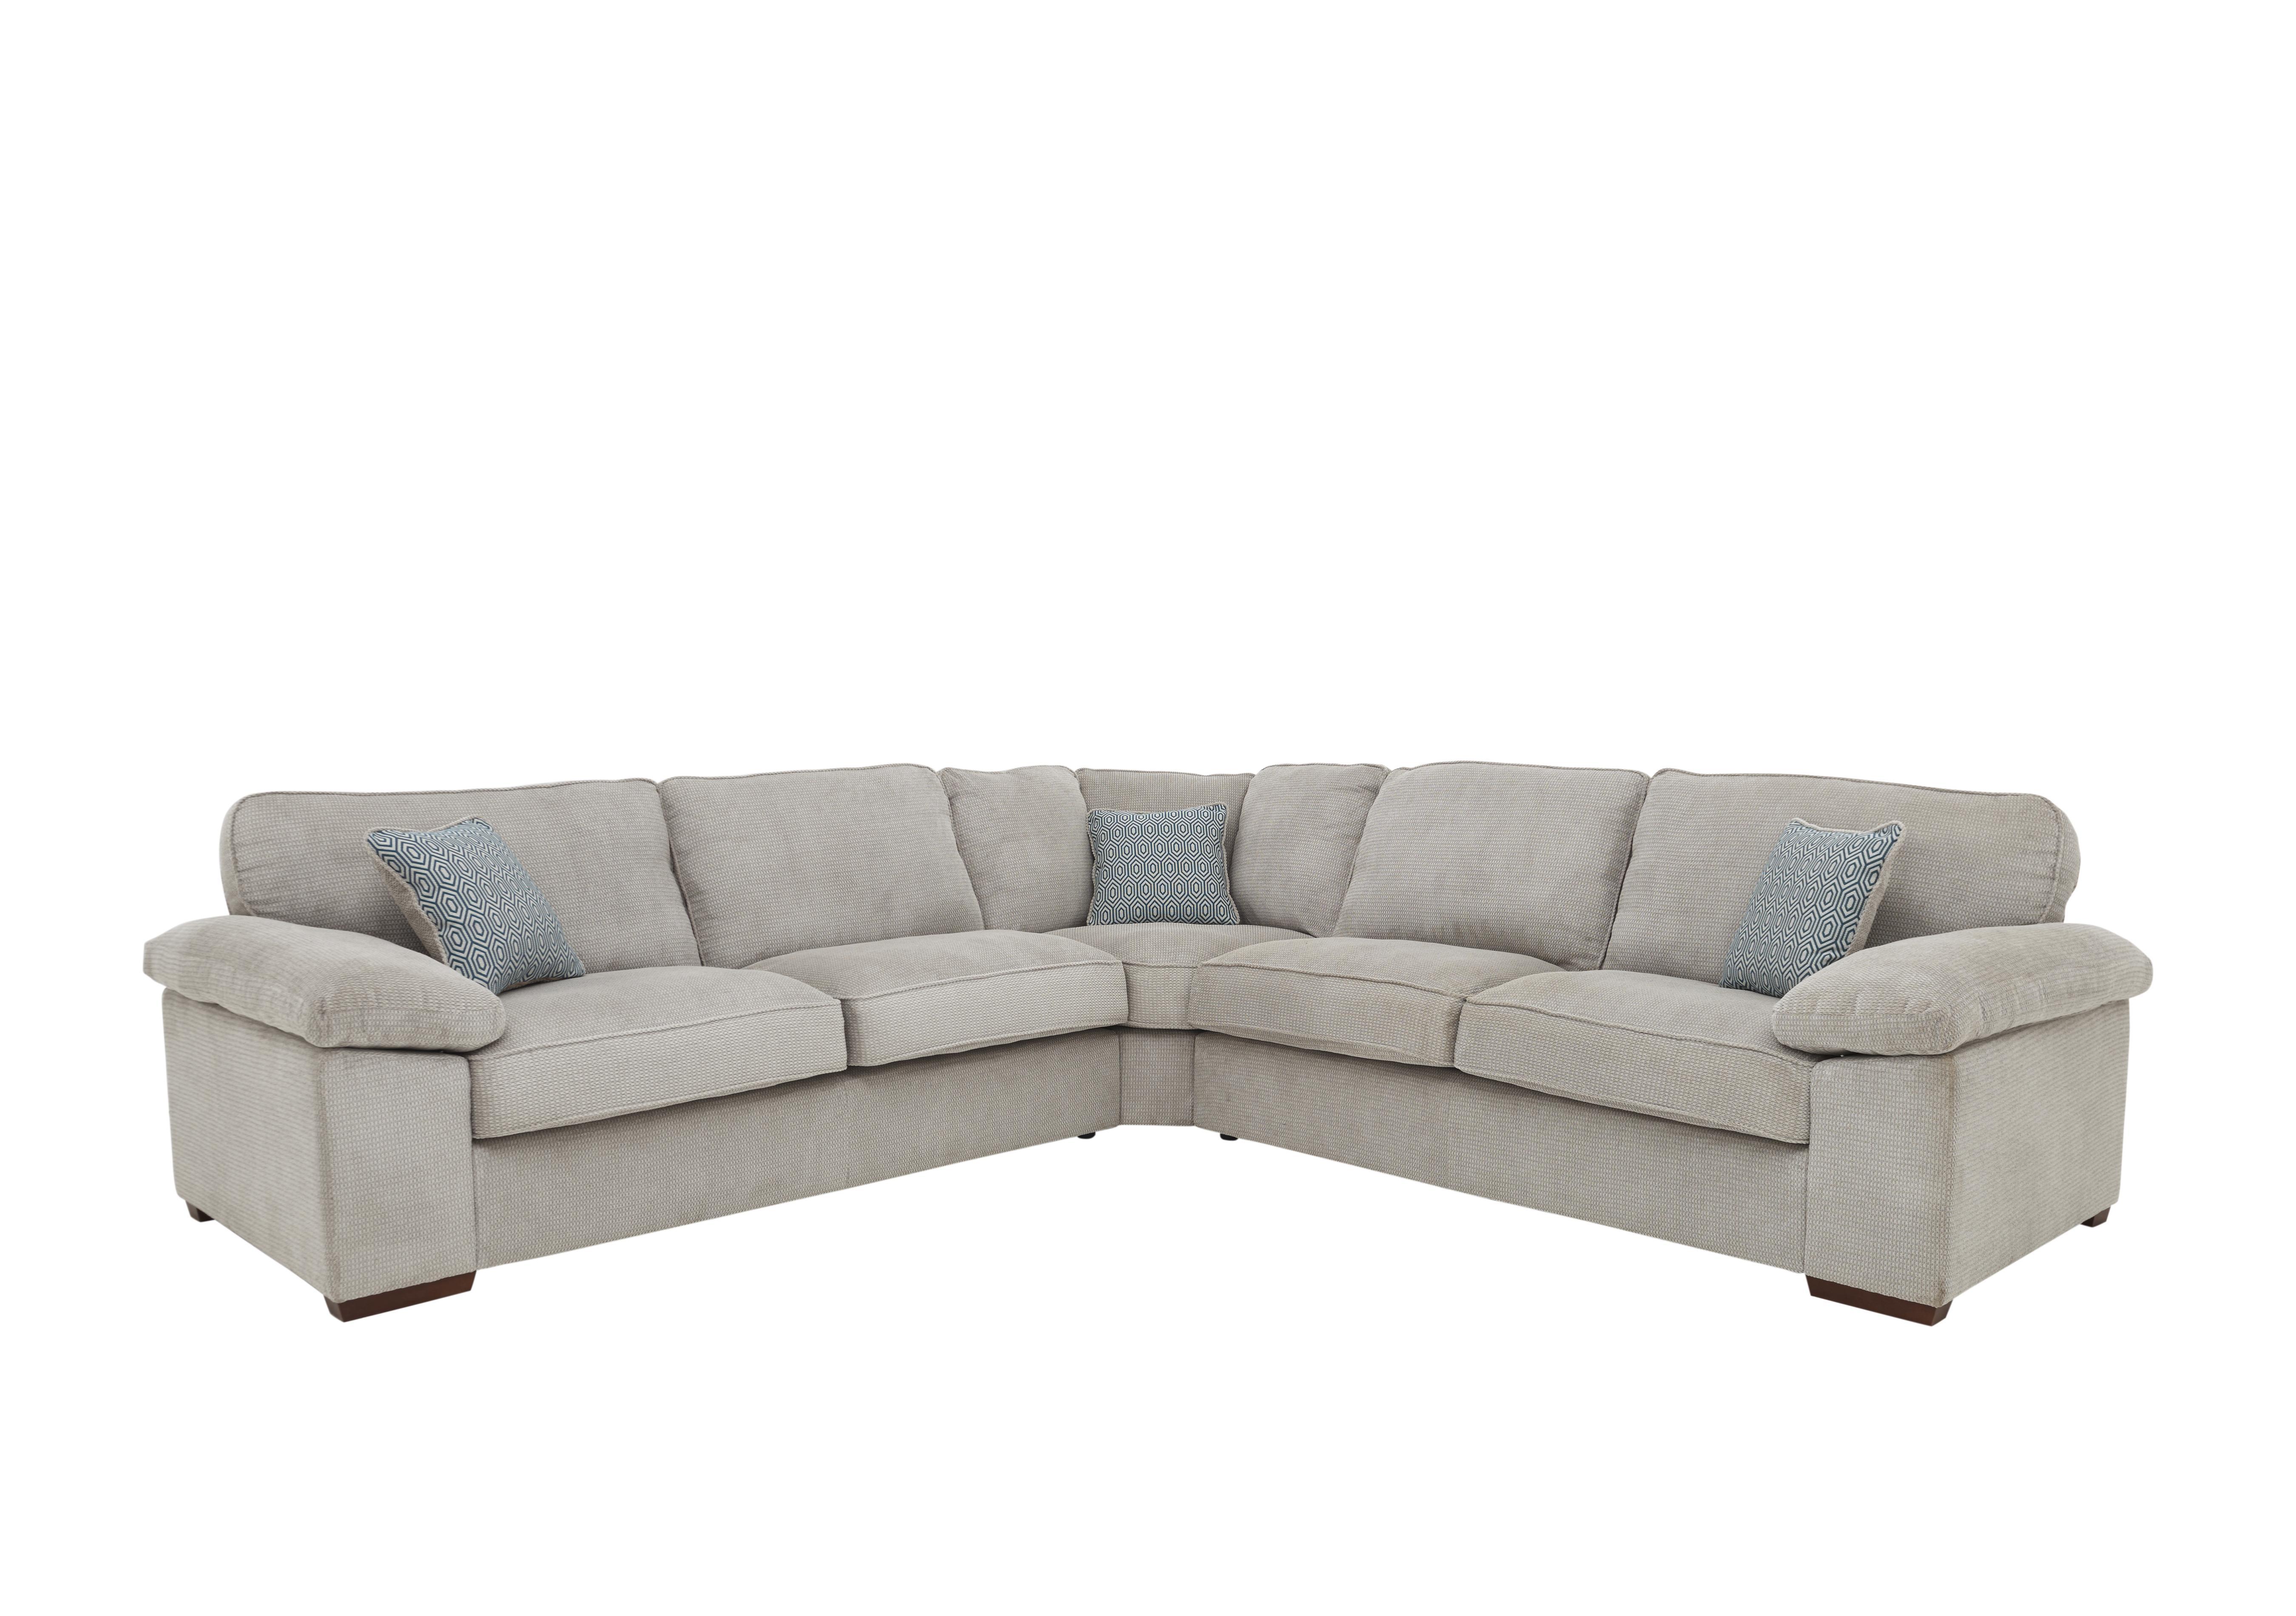 Home Large Fabric Corner Sofa - Furniture Village